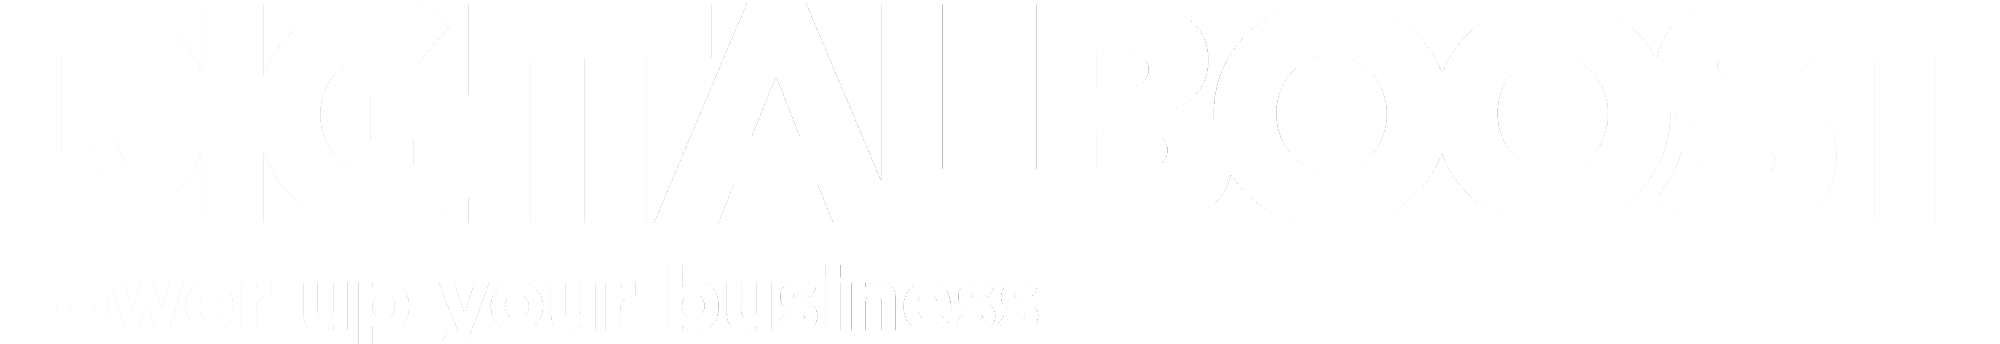 Digitalboost Logo Landscape Tagline White 2019 Update